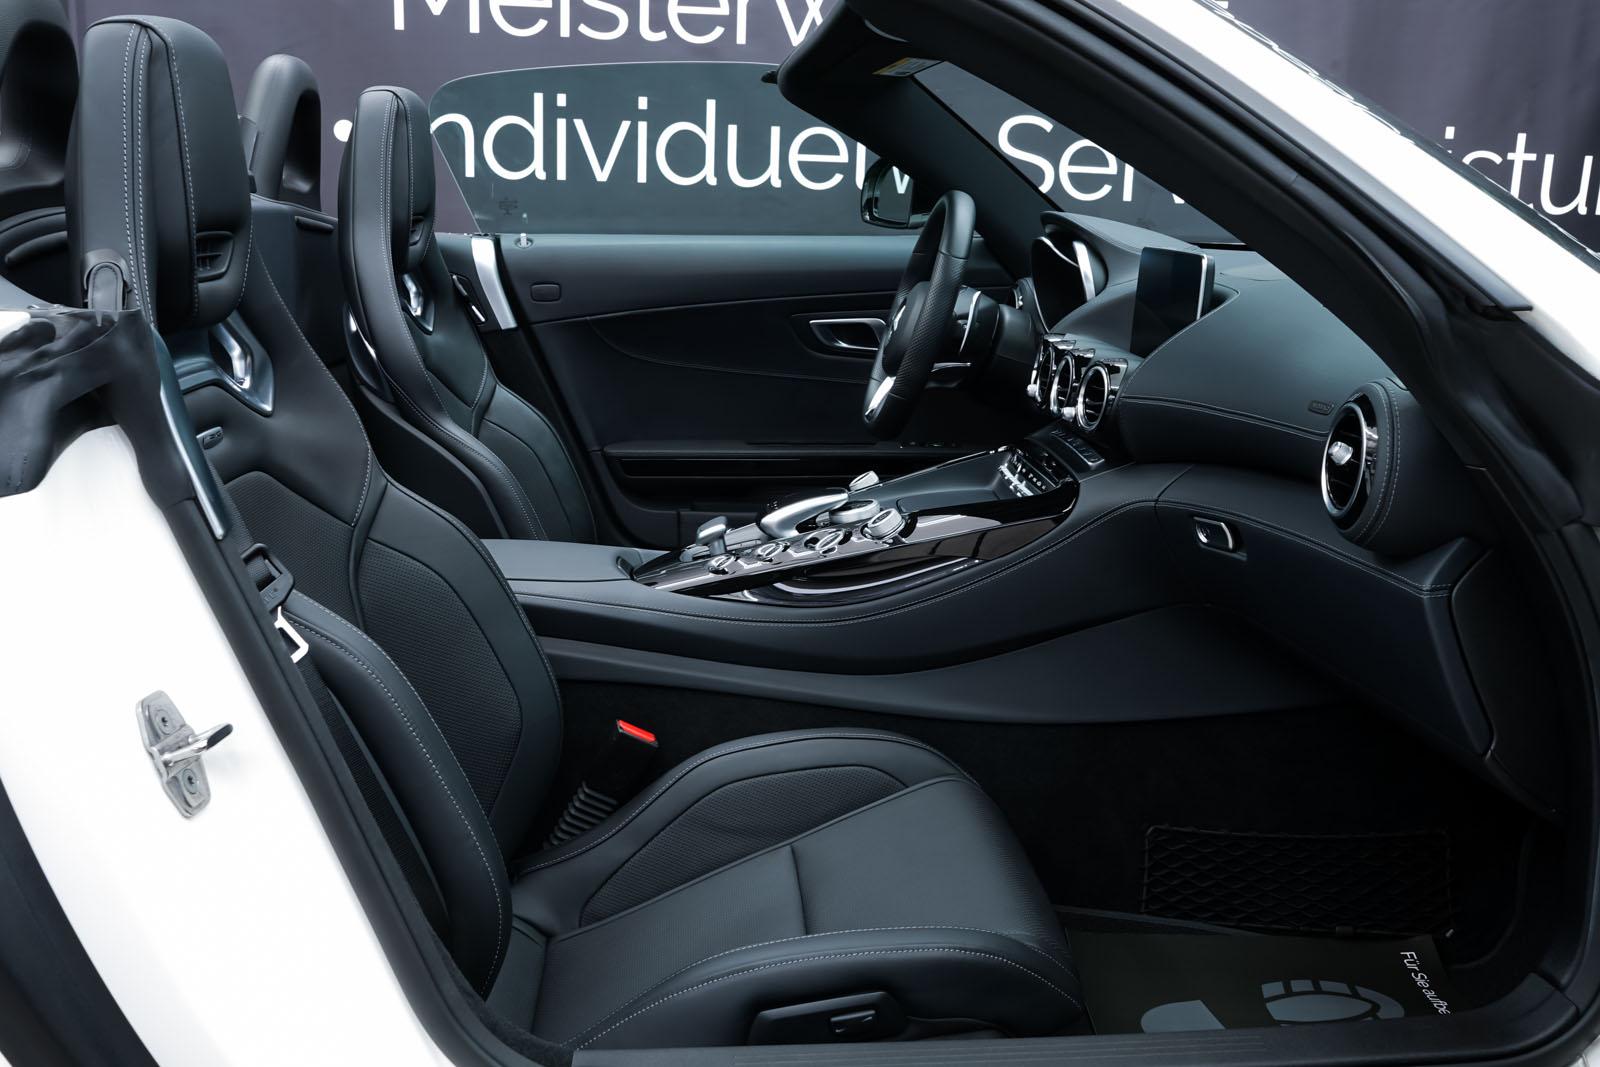 11Mercedes_Benz_AMG_GT_Roadster_Weiss_Schwarz_MB-9710_15_w